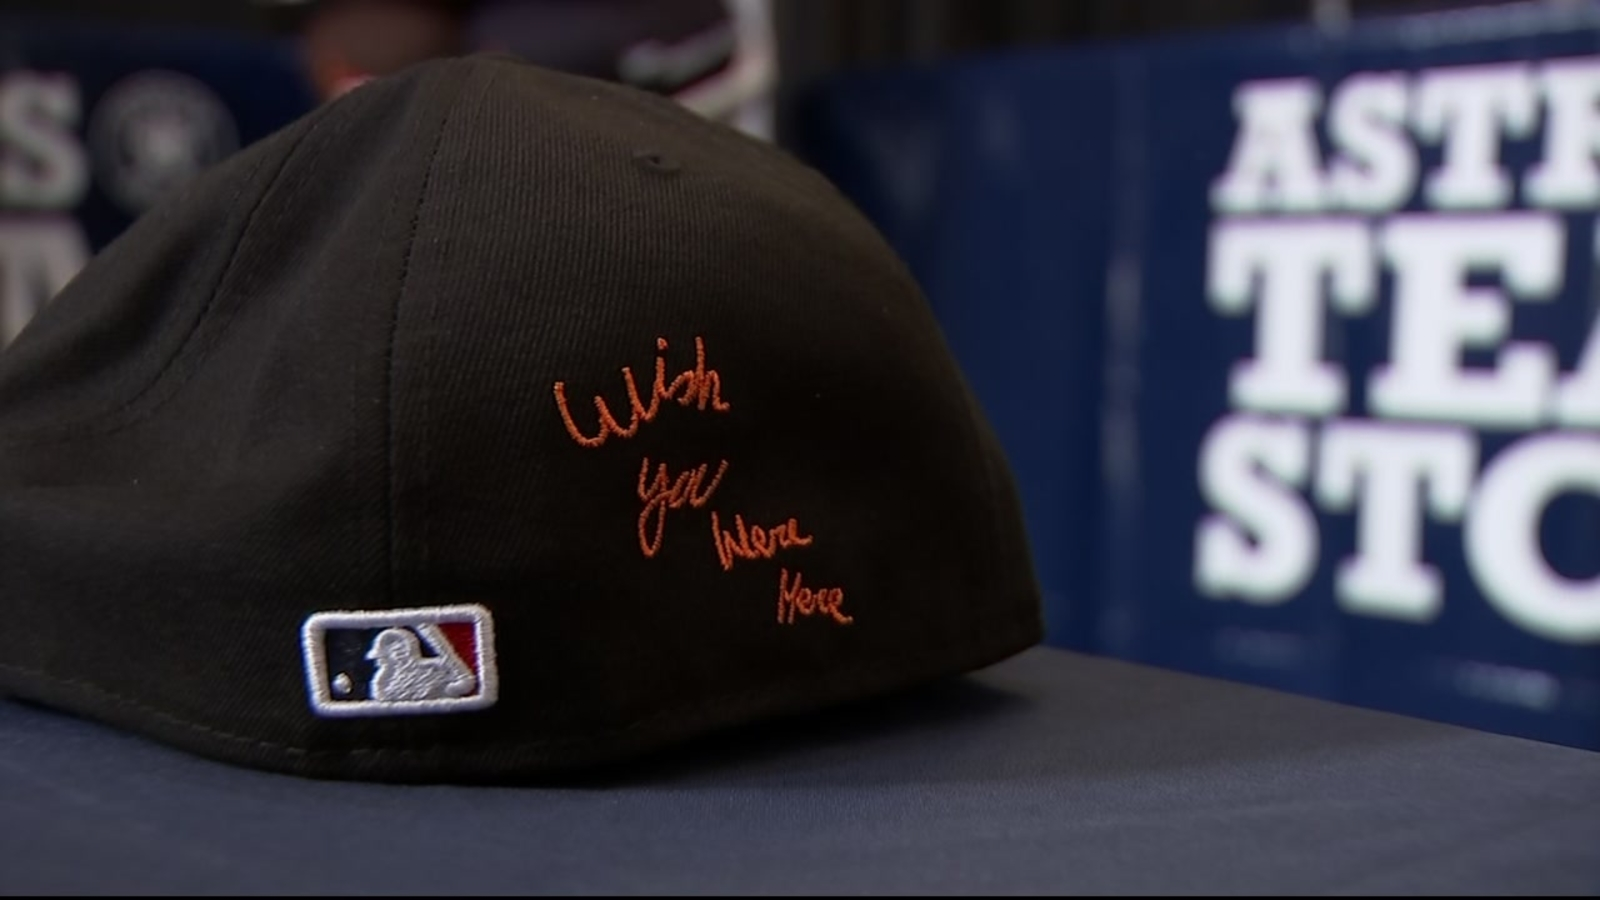 ba6fcf0153558 Houston Astros Travis Scott hats sold out